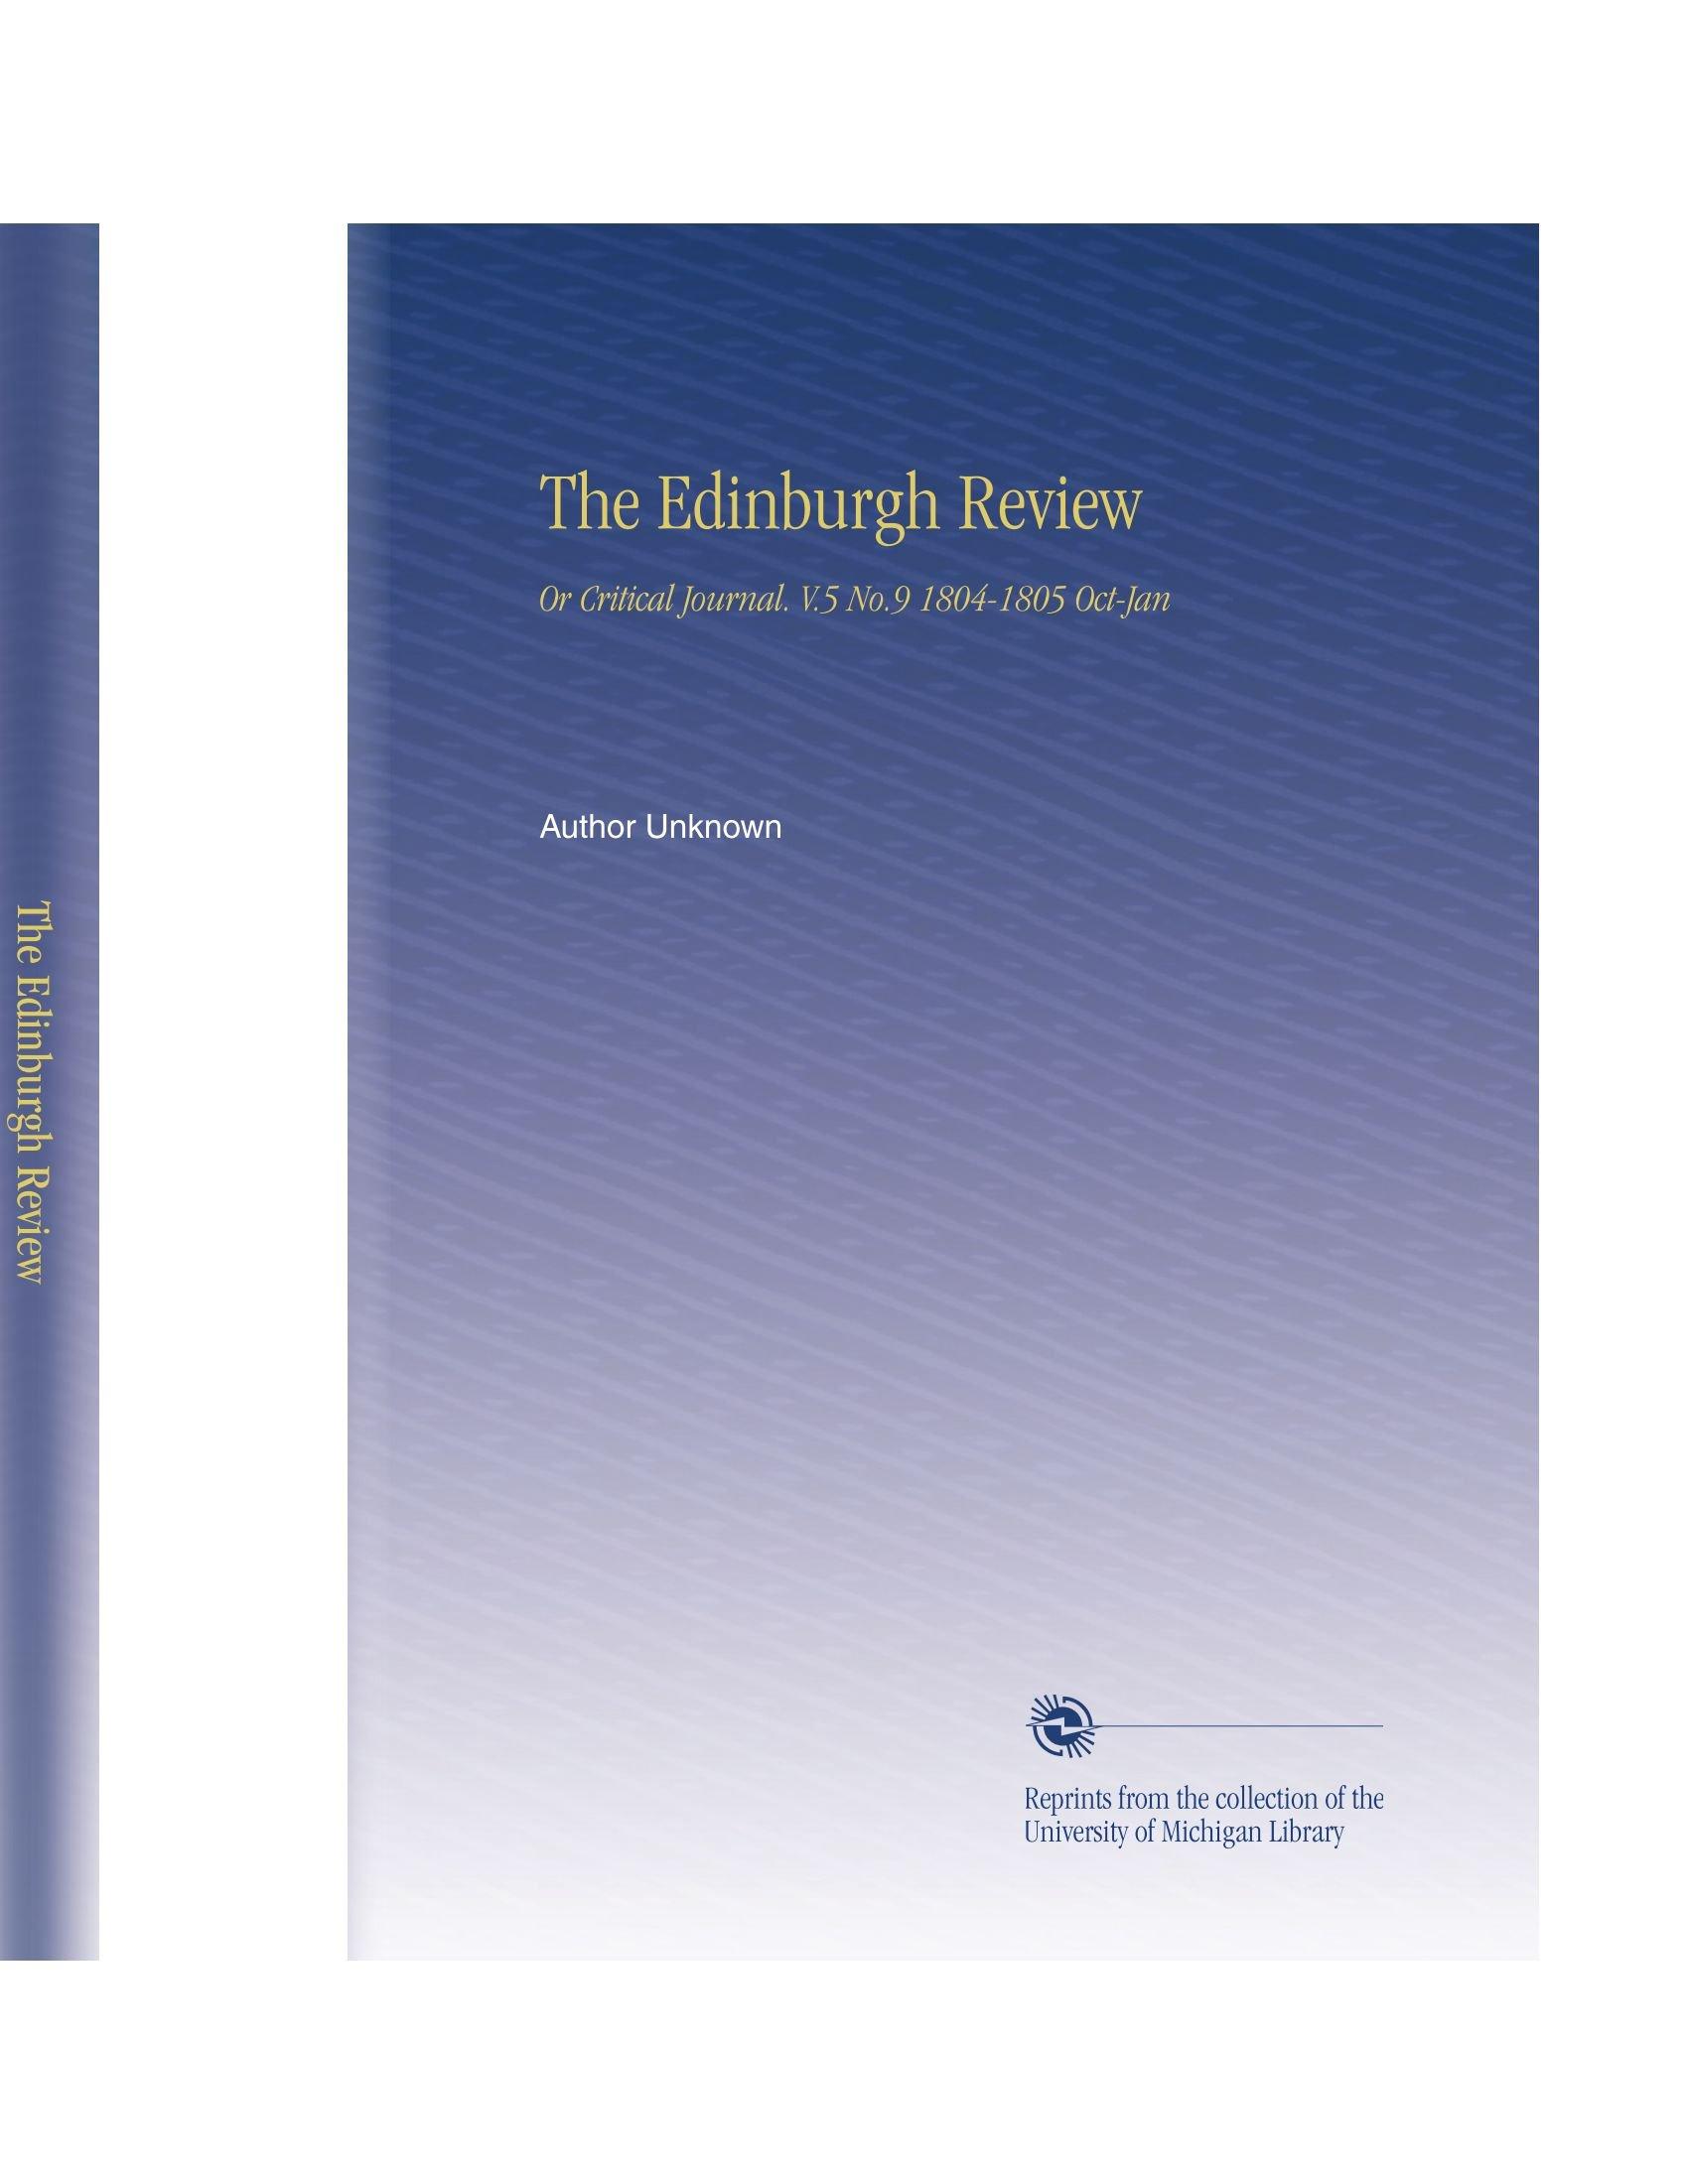 The Edinburgh Review: Or Critical Journal. V.5 No.9 1804-1805 Oct-Jan pdf